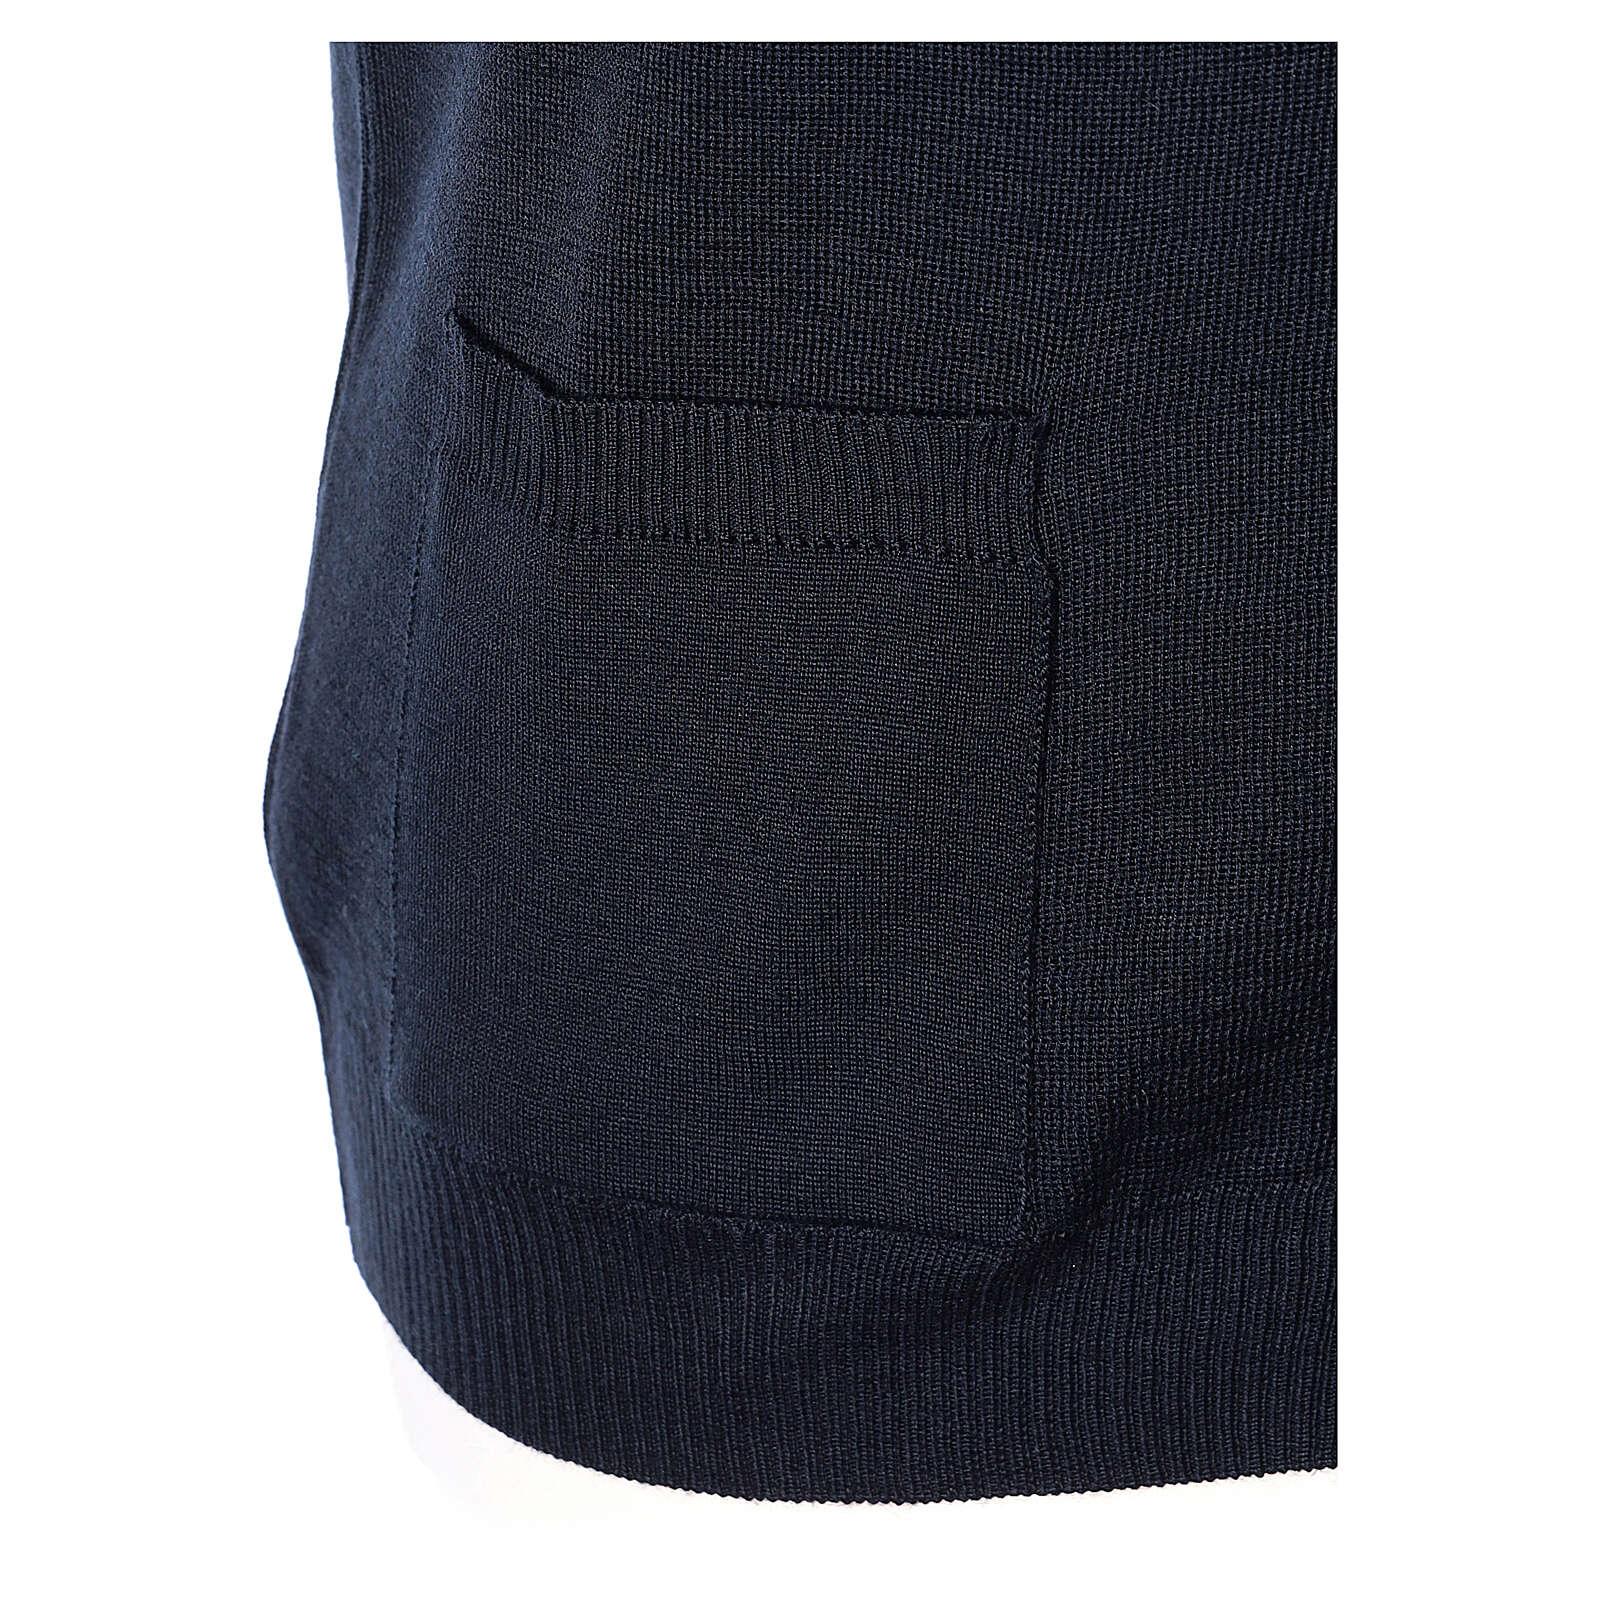 Colete sacerdote azul escuro aberto com bolsos e botões In Primis 4